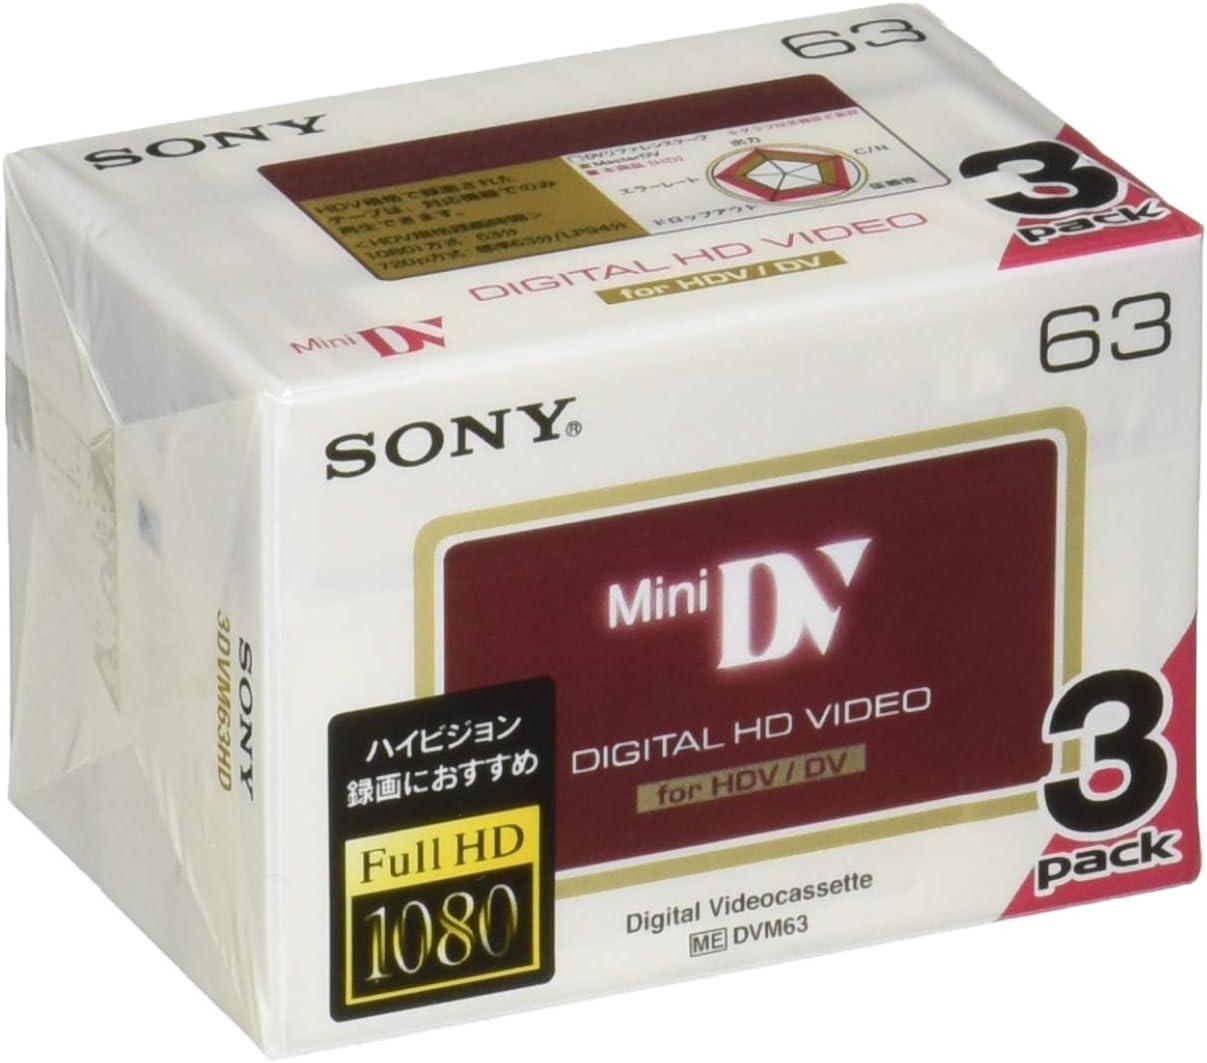 Panasonic Mini-DV Videocassette One Box of 5+1 Extra